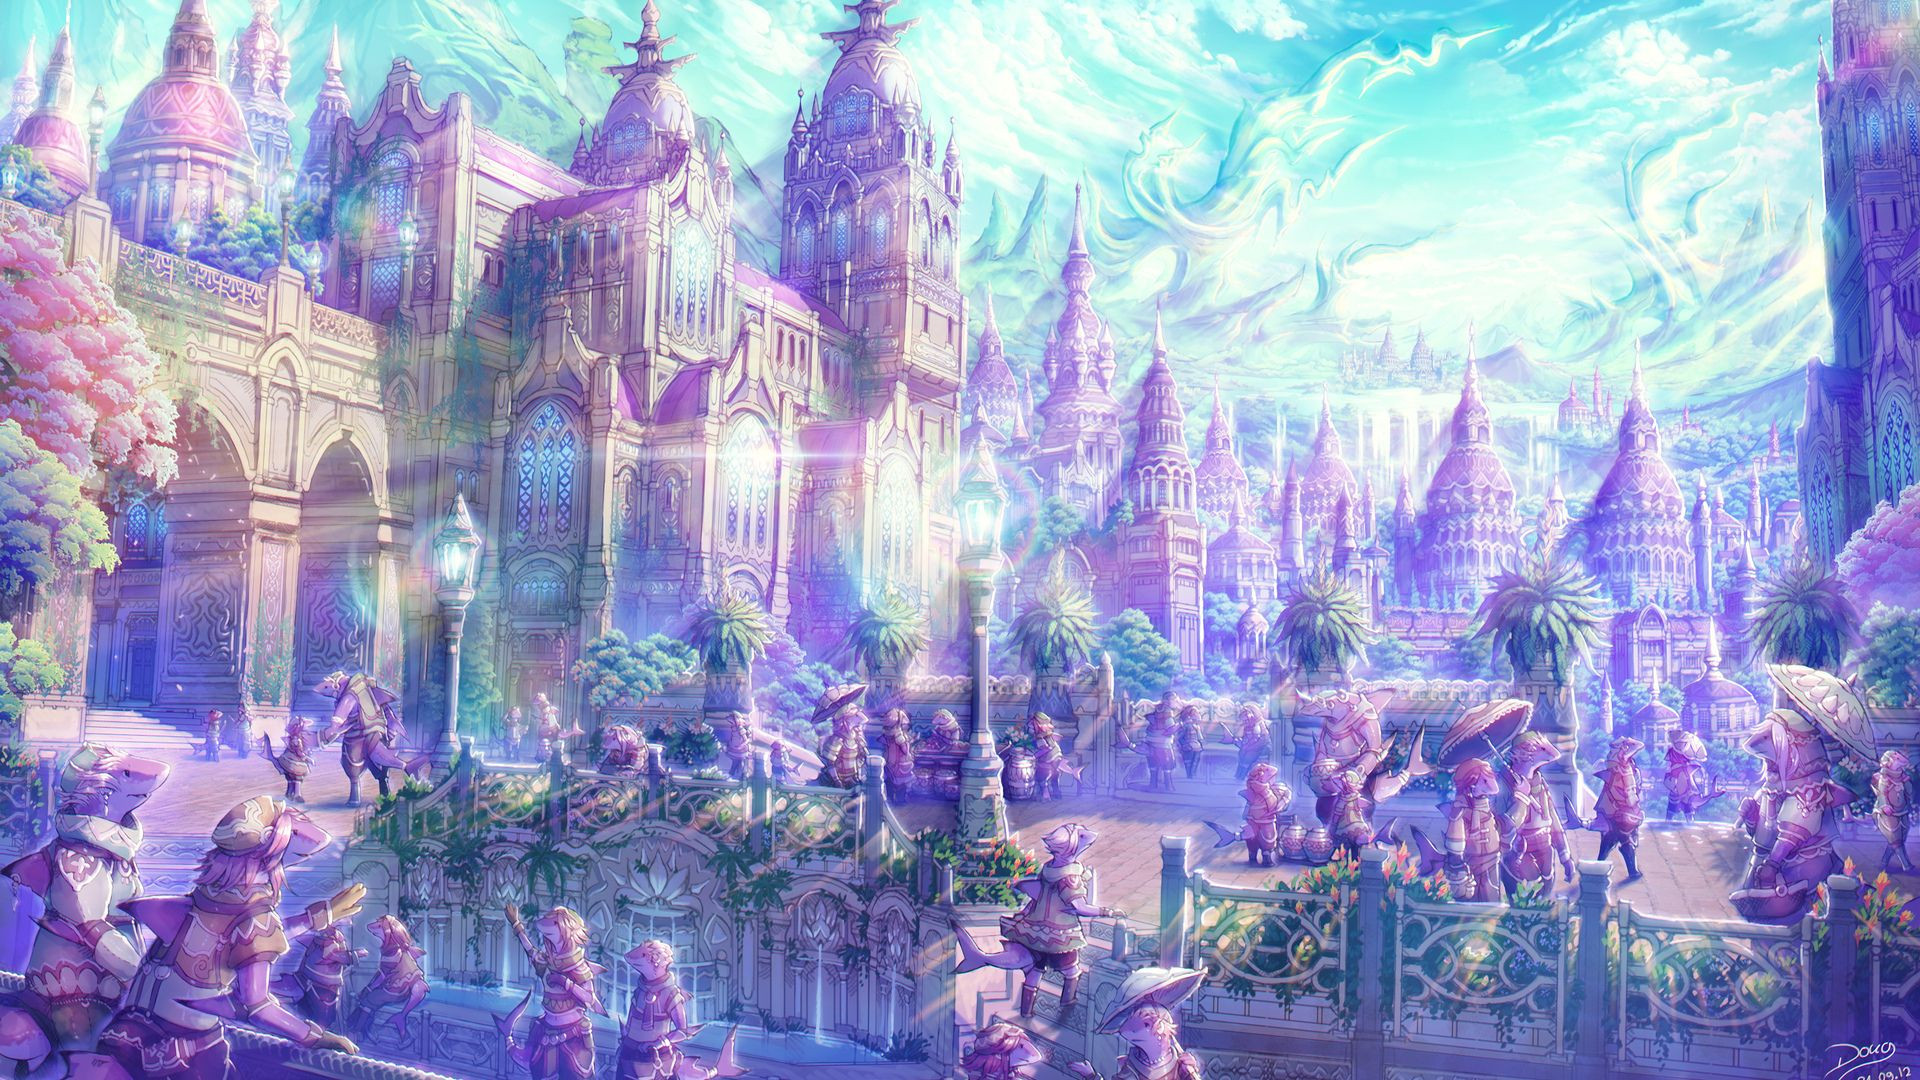 magical fantasy landscapes landscape - photo #27